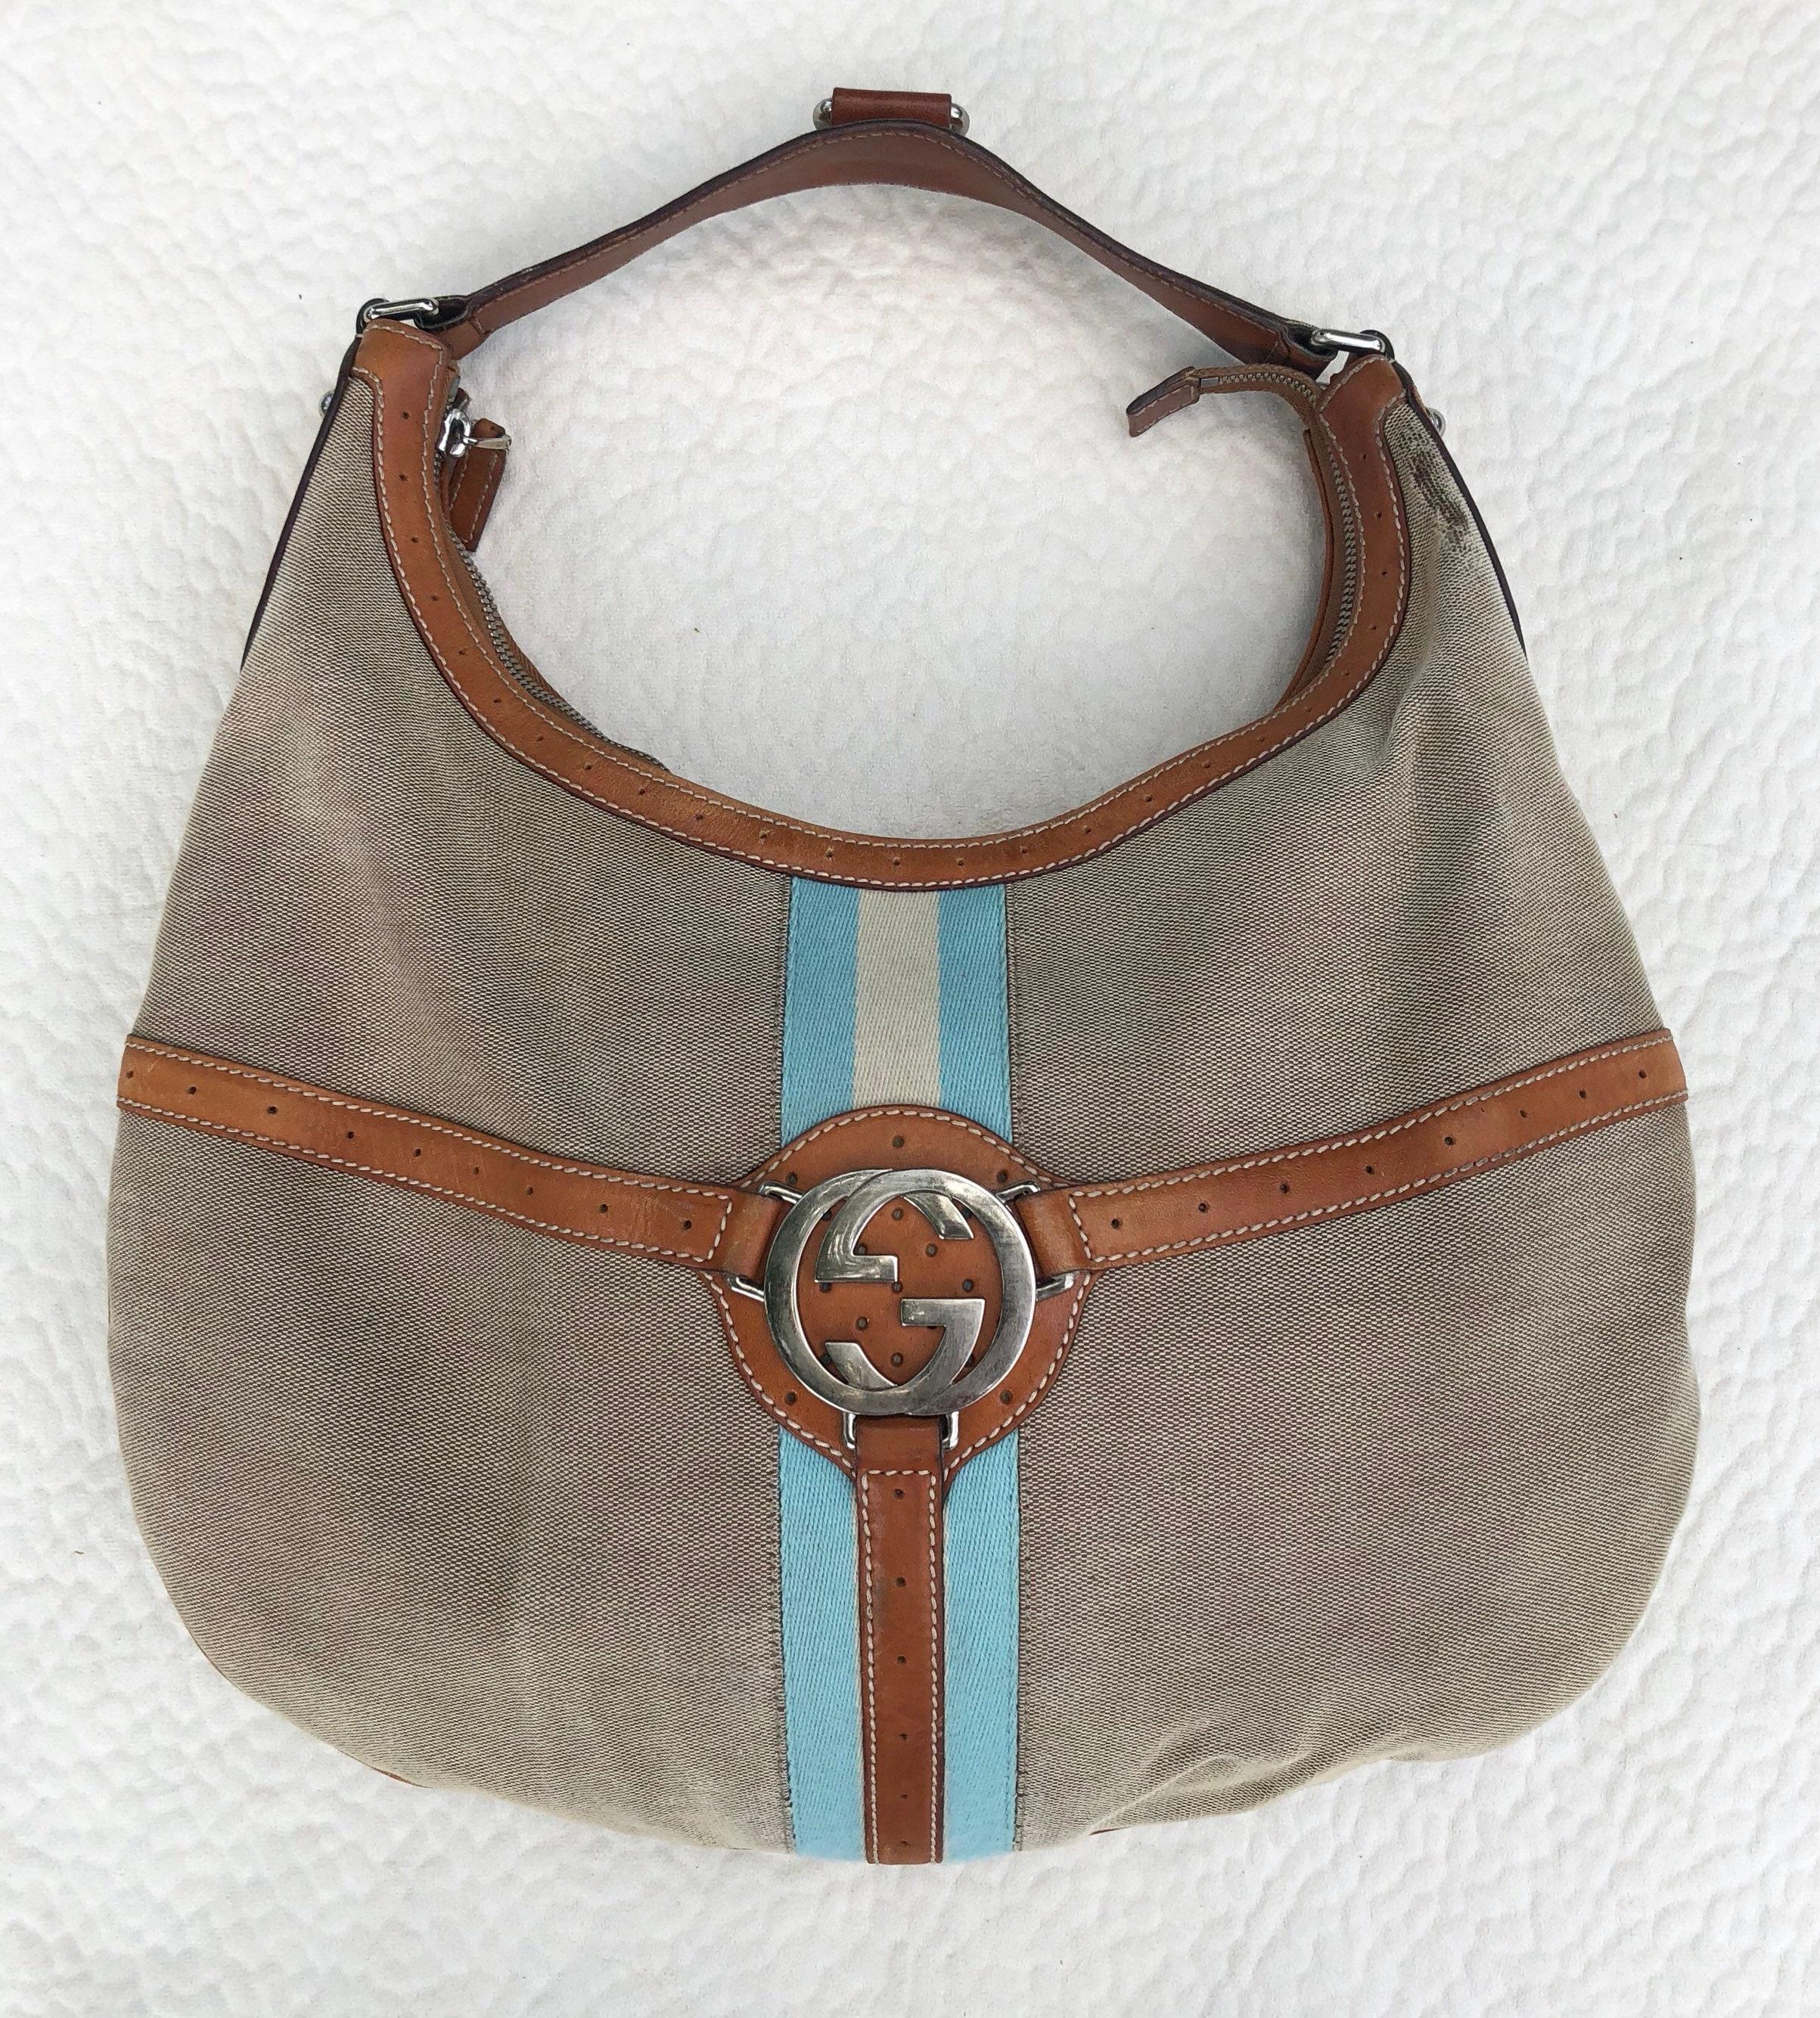 Vintage GUCCI tan canvas Jackie O Blondie hobo shoulder bag  682b5ed651e3f